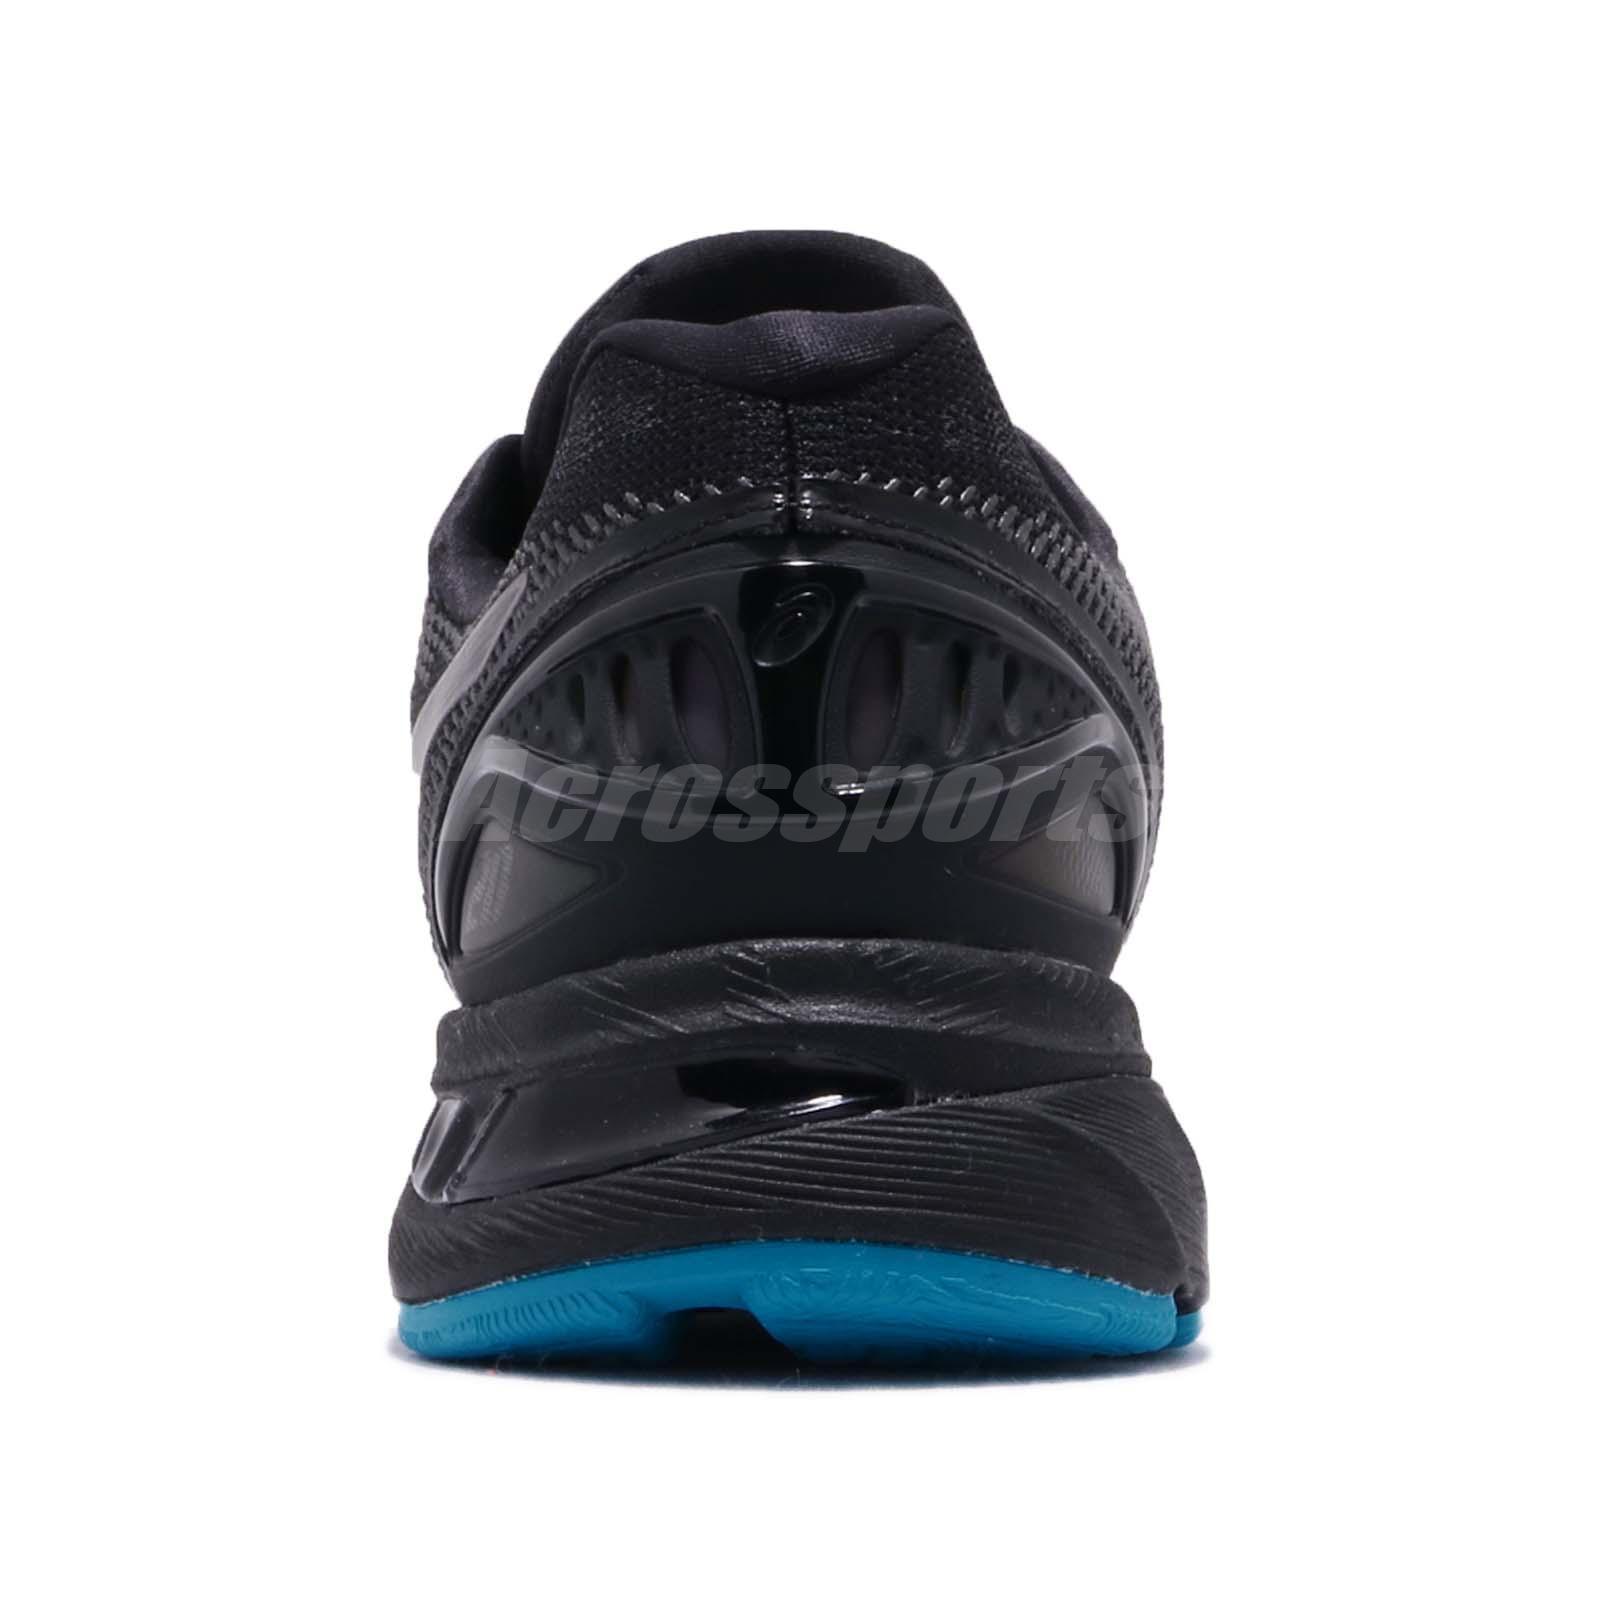 Tiempo de día mayoria Joya  Asics Gel-Nimbus 20 Lite-Show Black Reflective Men Running Shoes  1011A043-001 Fitness, Running & Yoga Shoes